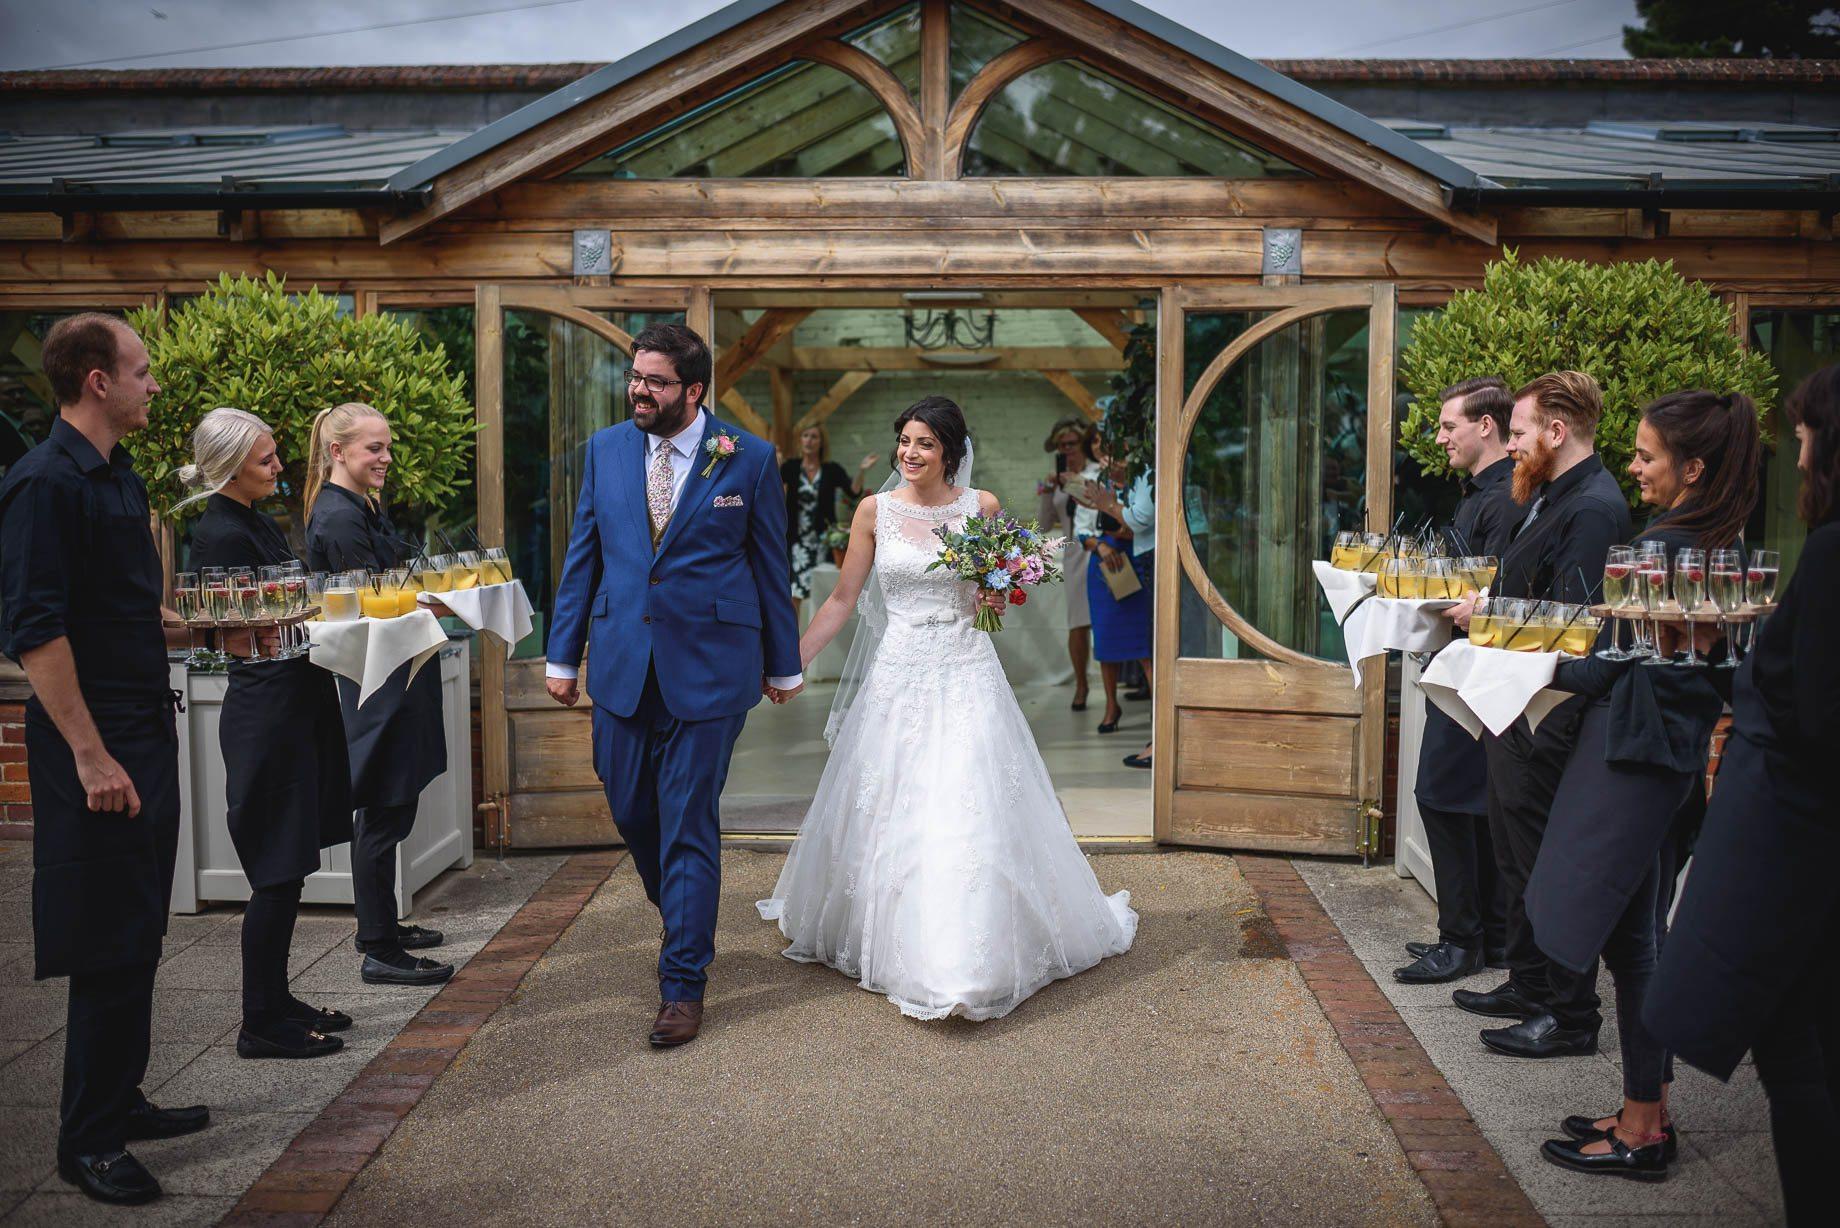 Gaynes Park wedding photography - Guy Collier Photography - Rachel and Jon (74 of 169)